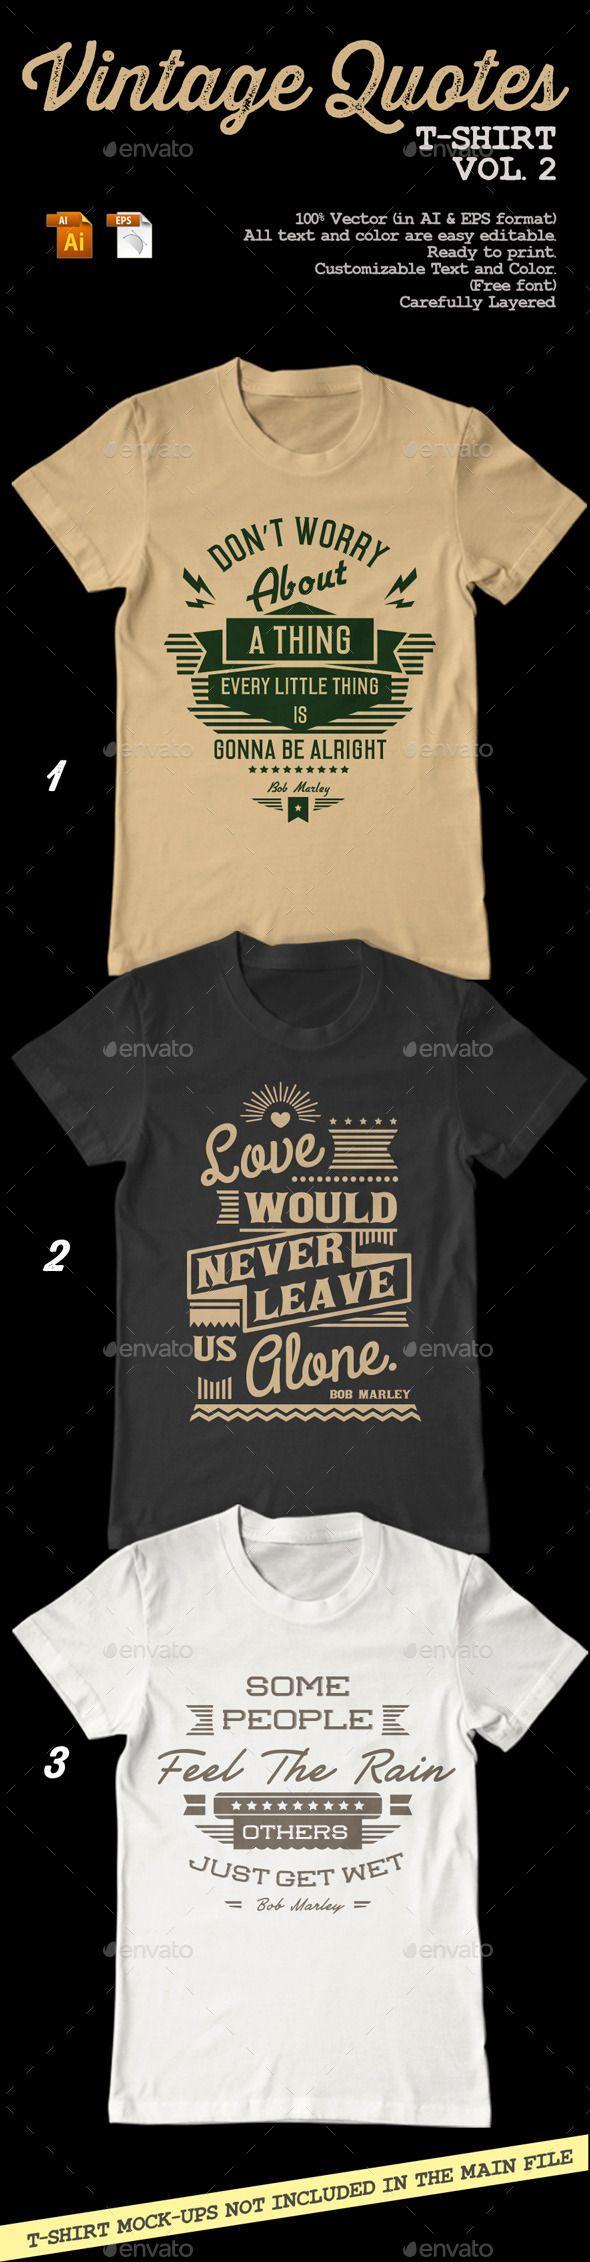 Vintage Quotes T-Shirt Vol. 2